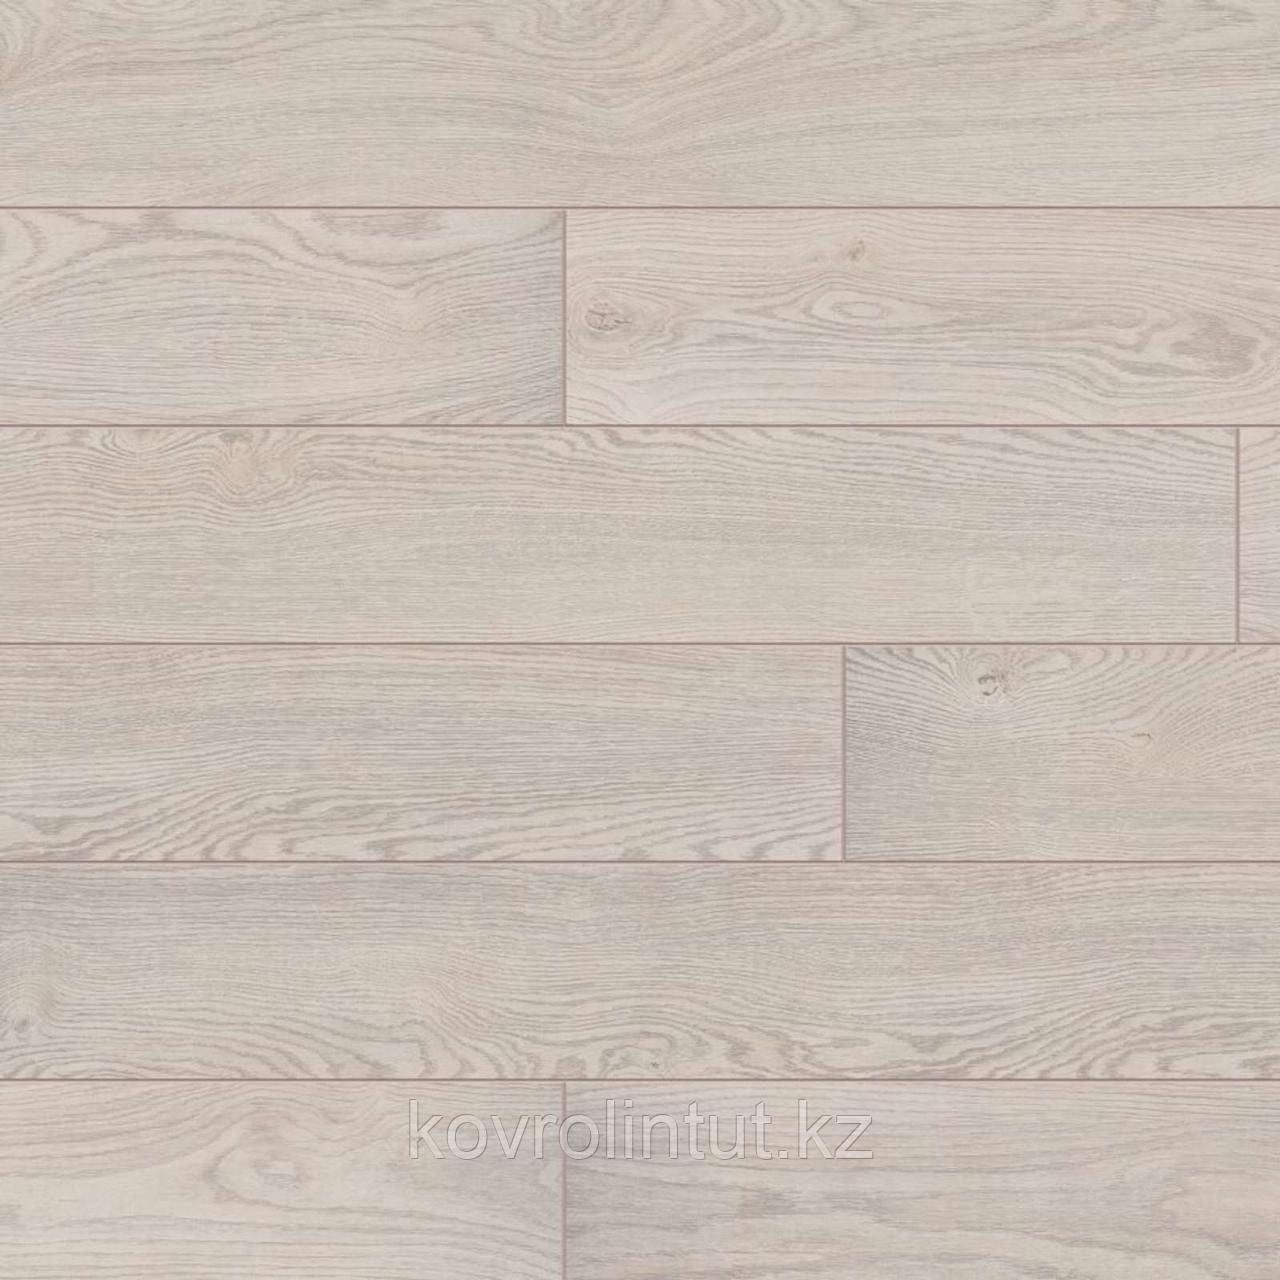 Ламинат Classen Impression WR 52799 Bassano Oak , 1285x158x10мм, 33кл (1 ,624м2, 8шт в уп)